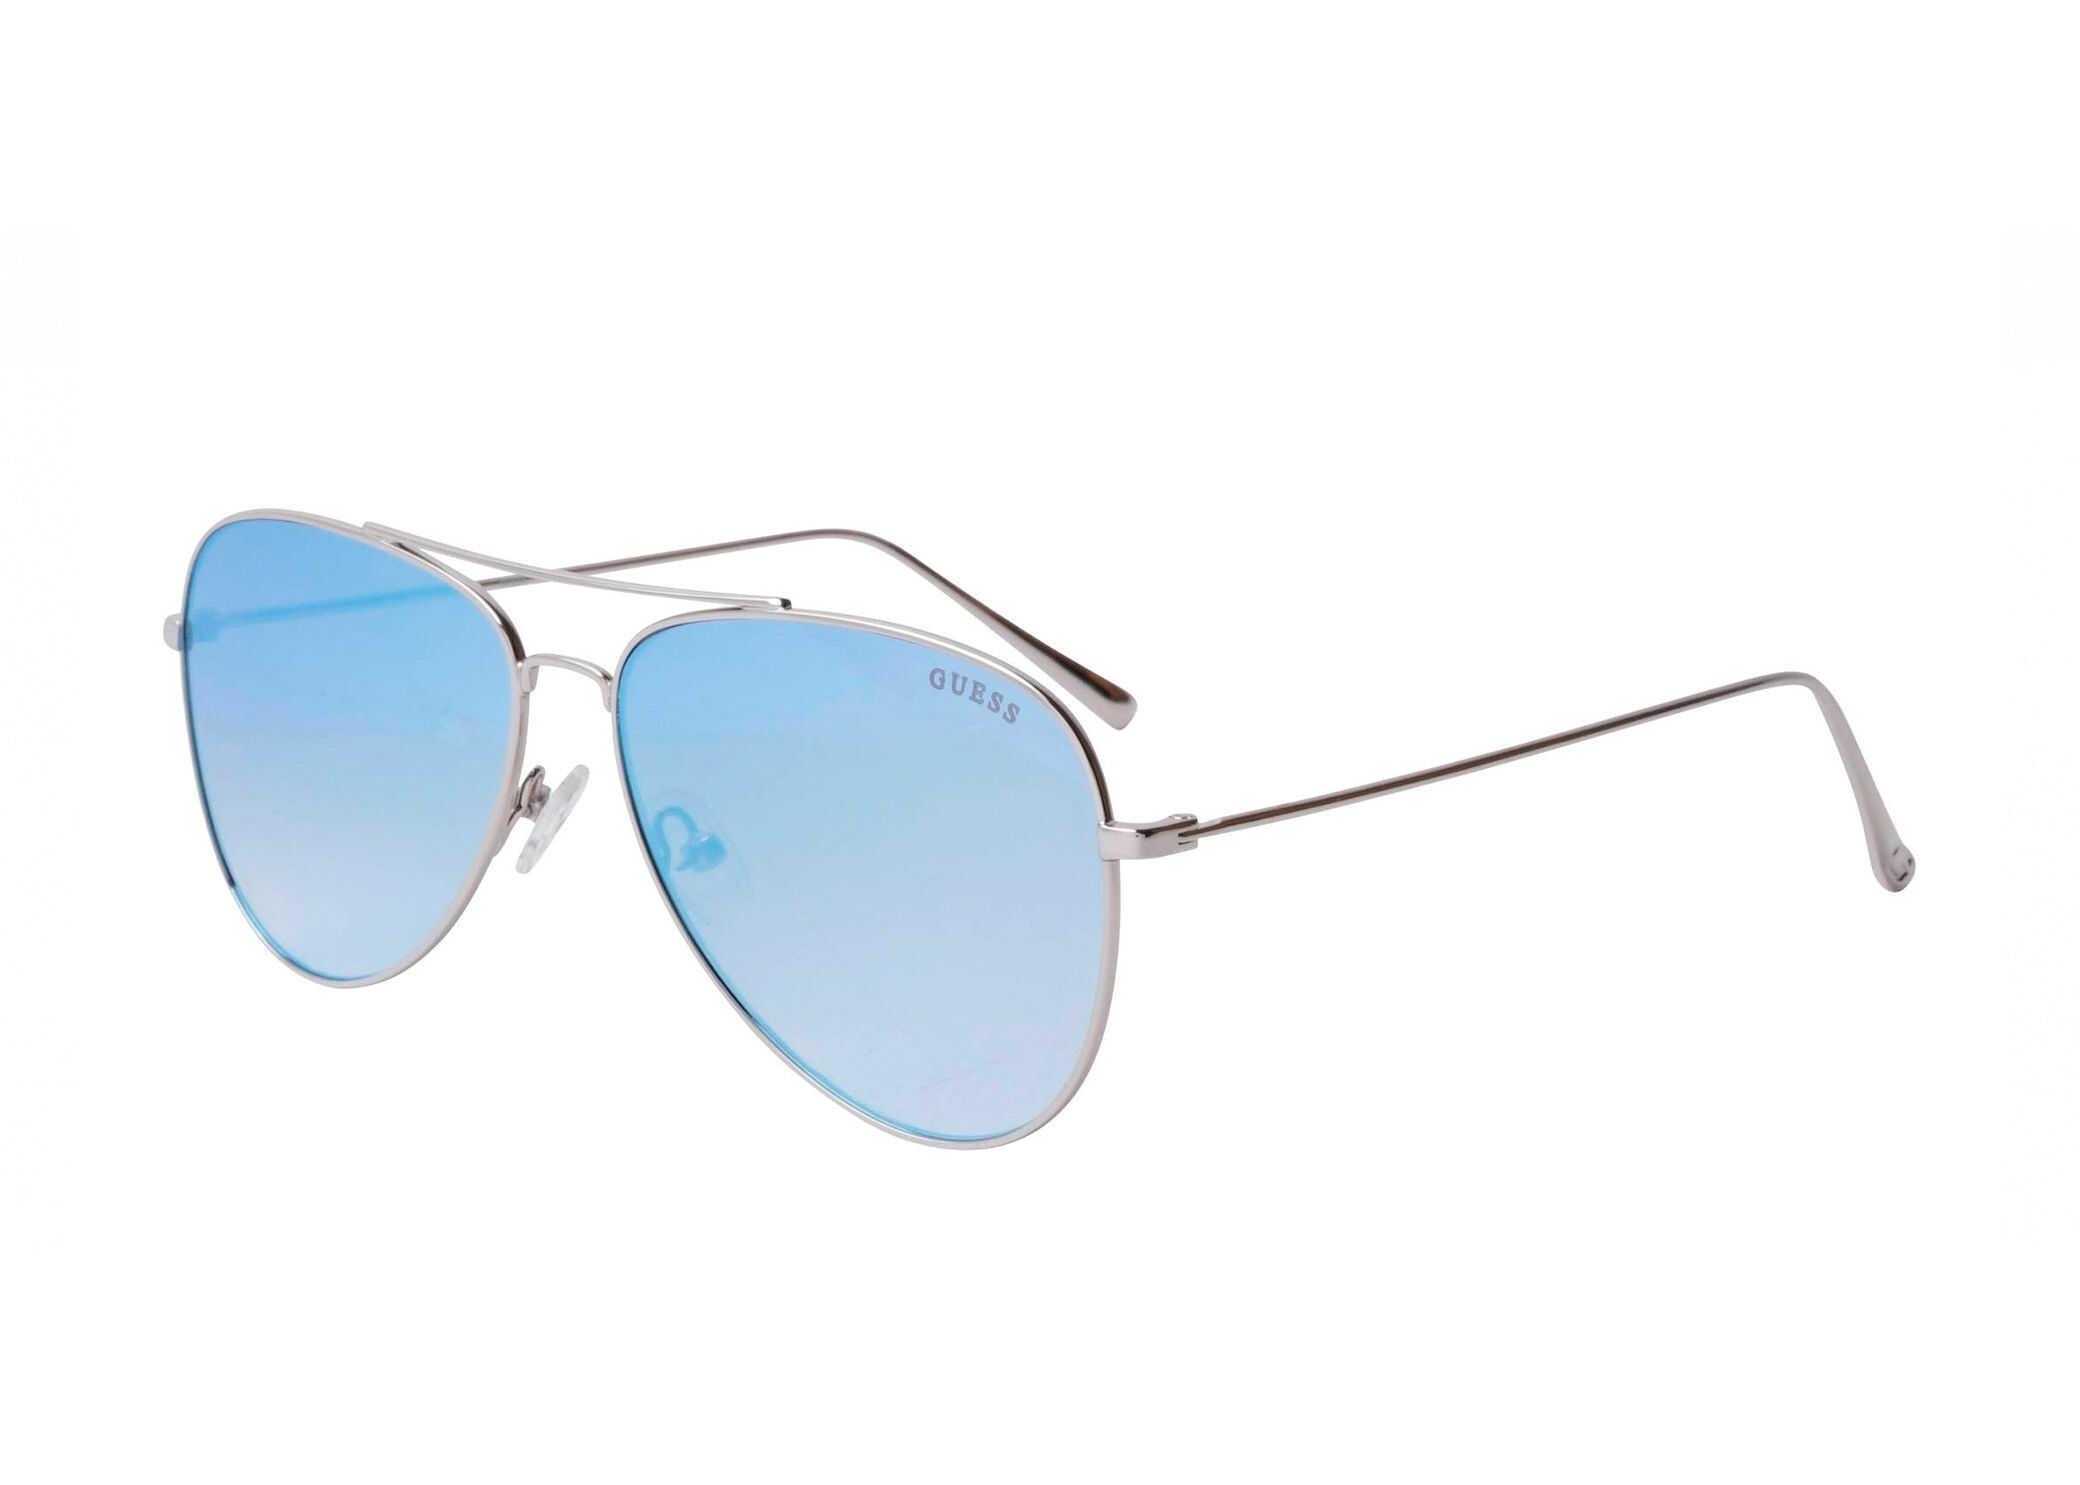 GUESS Gf6035 Blue